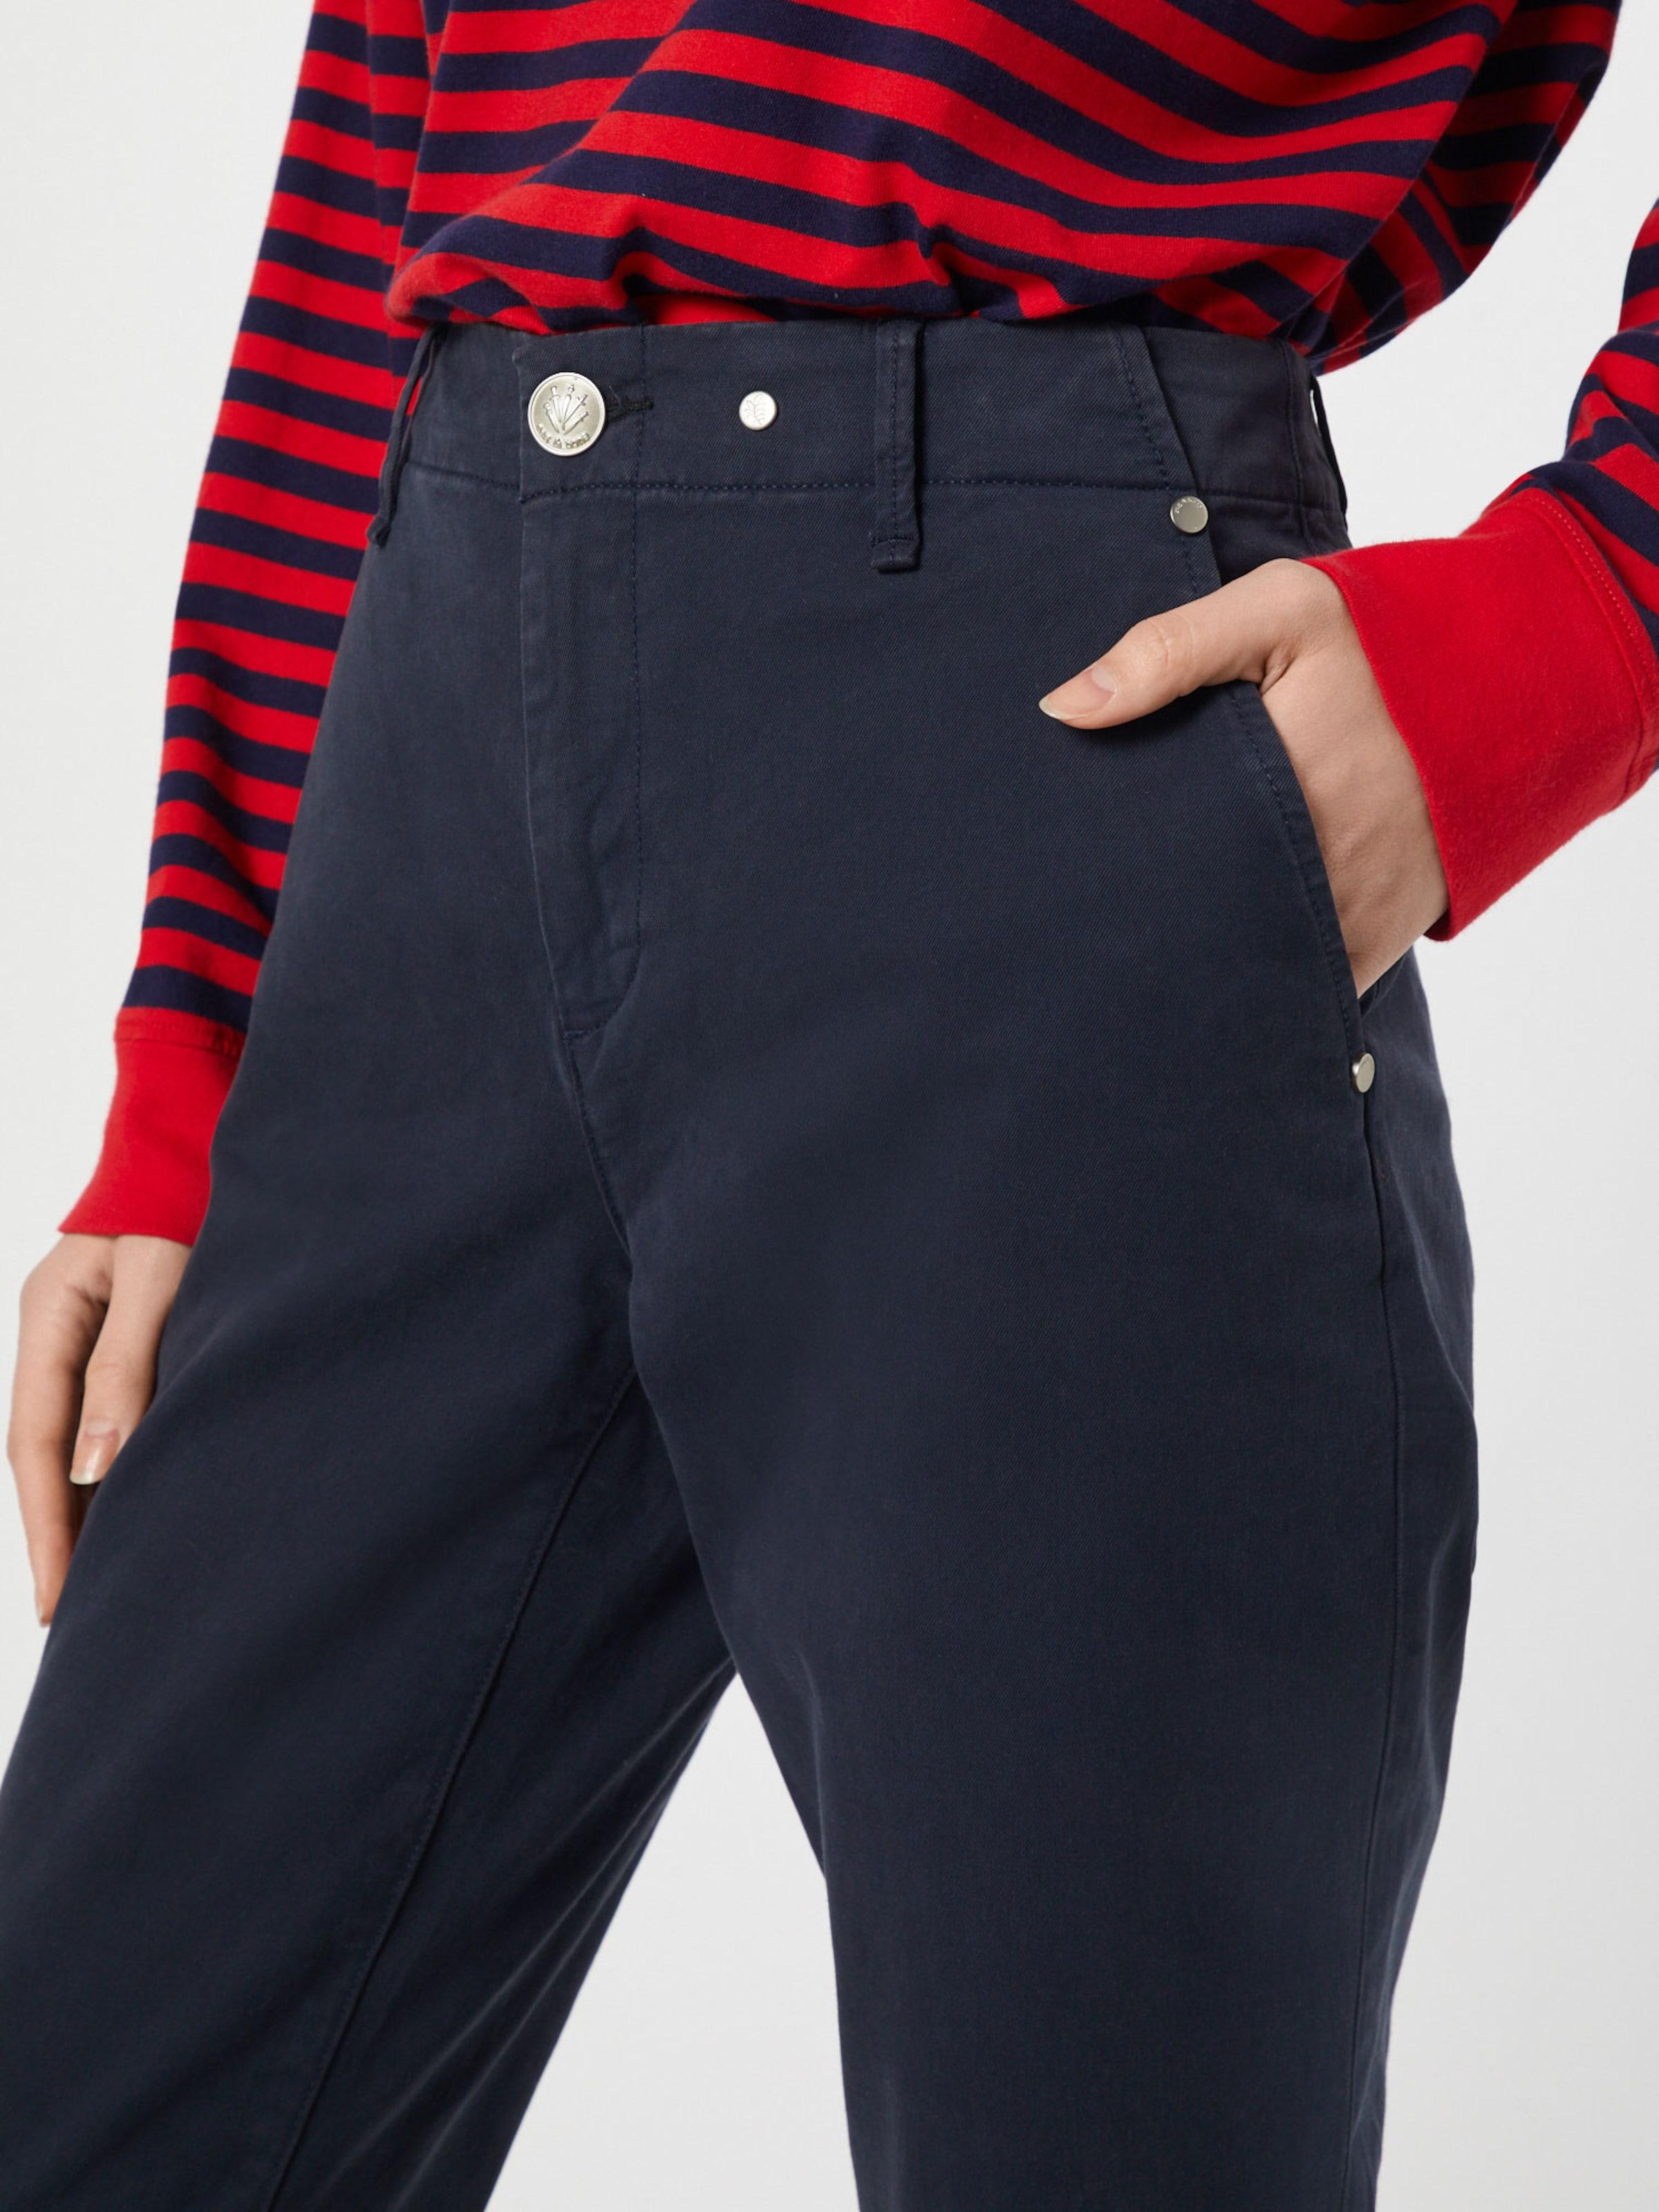 Beige Pantalon Chino Bone 'buckley' Ragamp; En tsdCQhrx